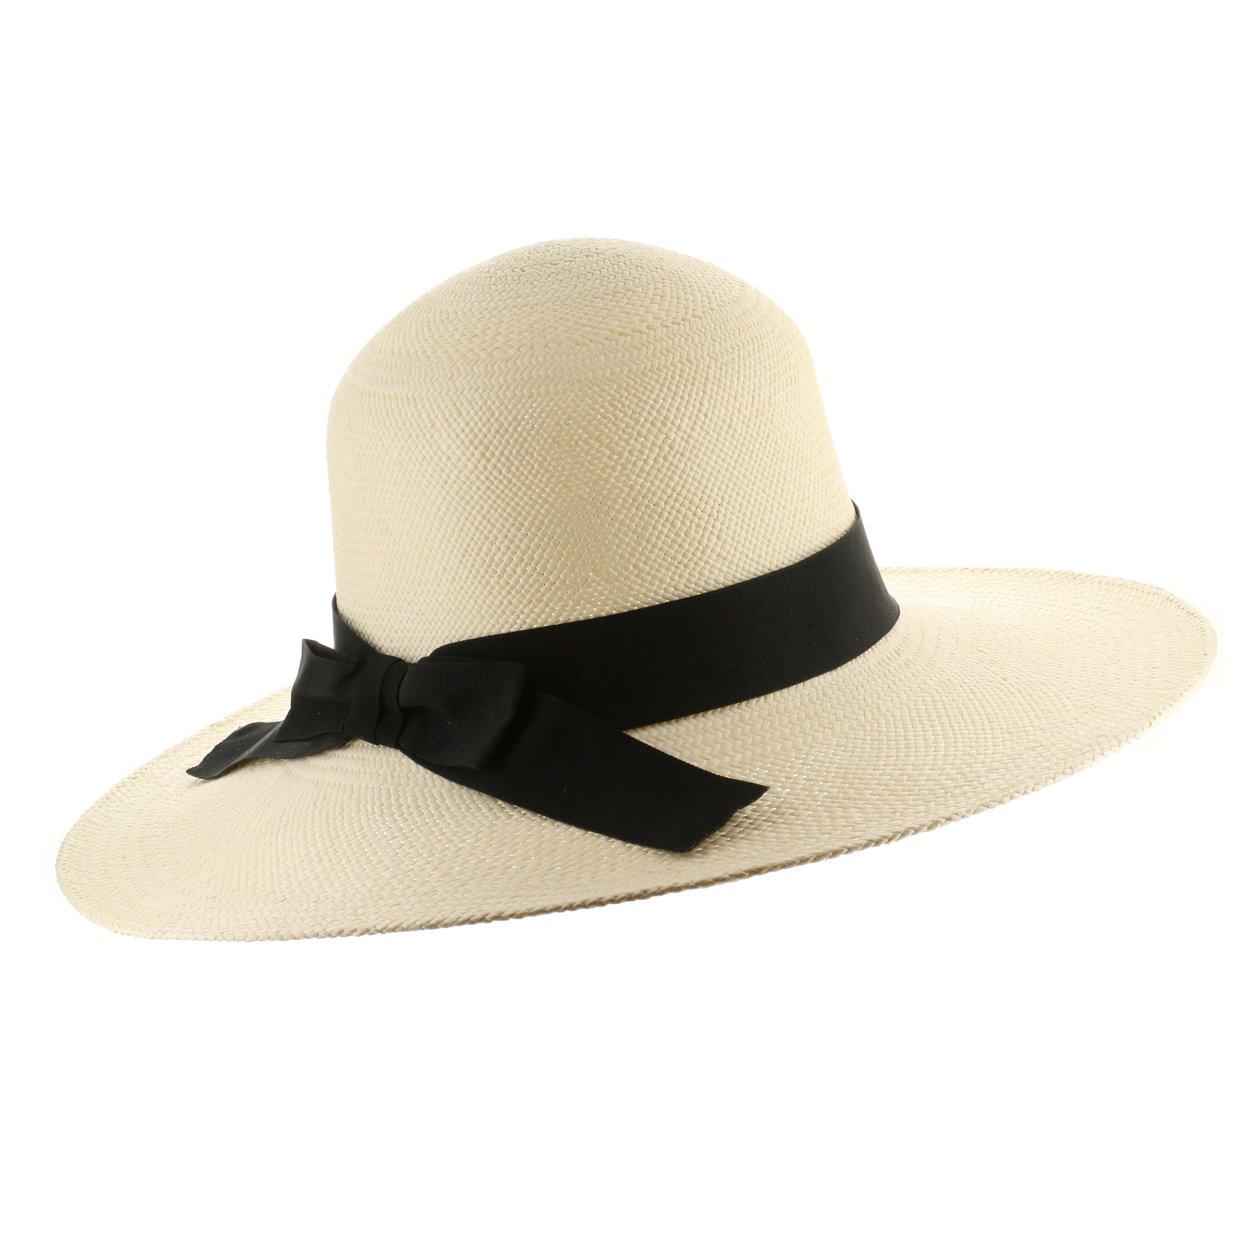 Ultrafino Classic Coco Womens Straw Panama Hat 6 7/8 by Ultrafino